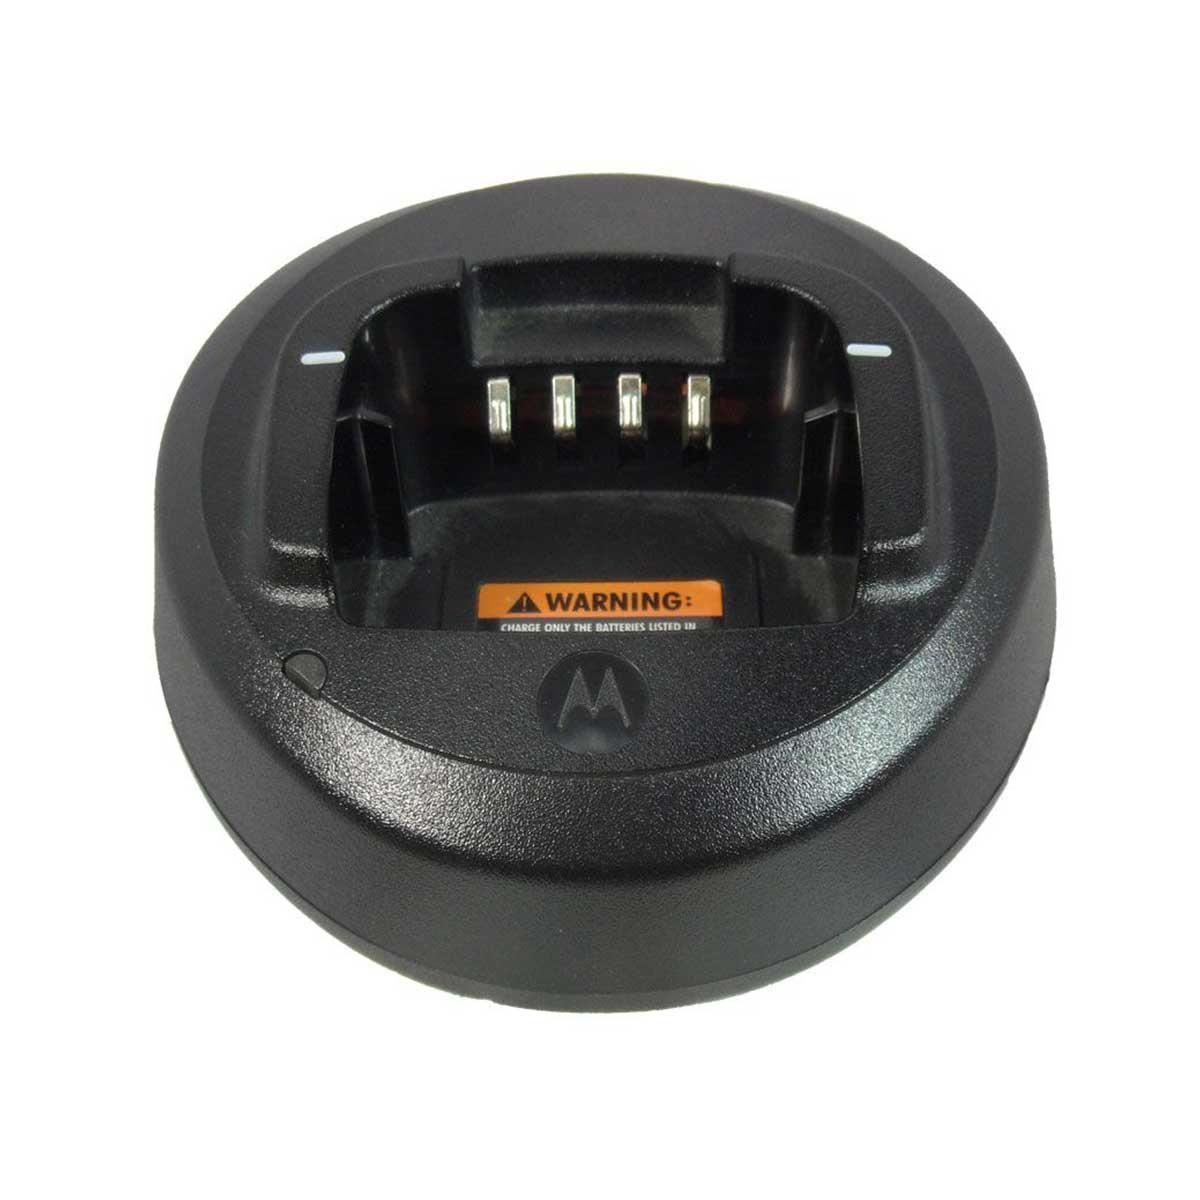 Cargador individual Motorola PMLN5228 para radio EP350